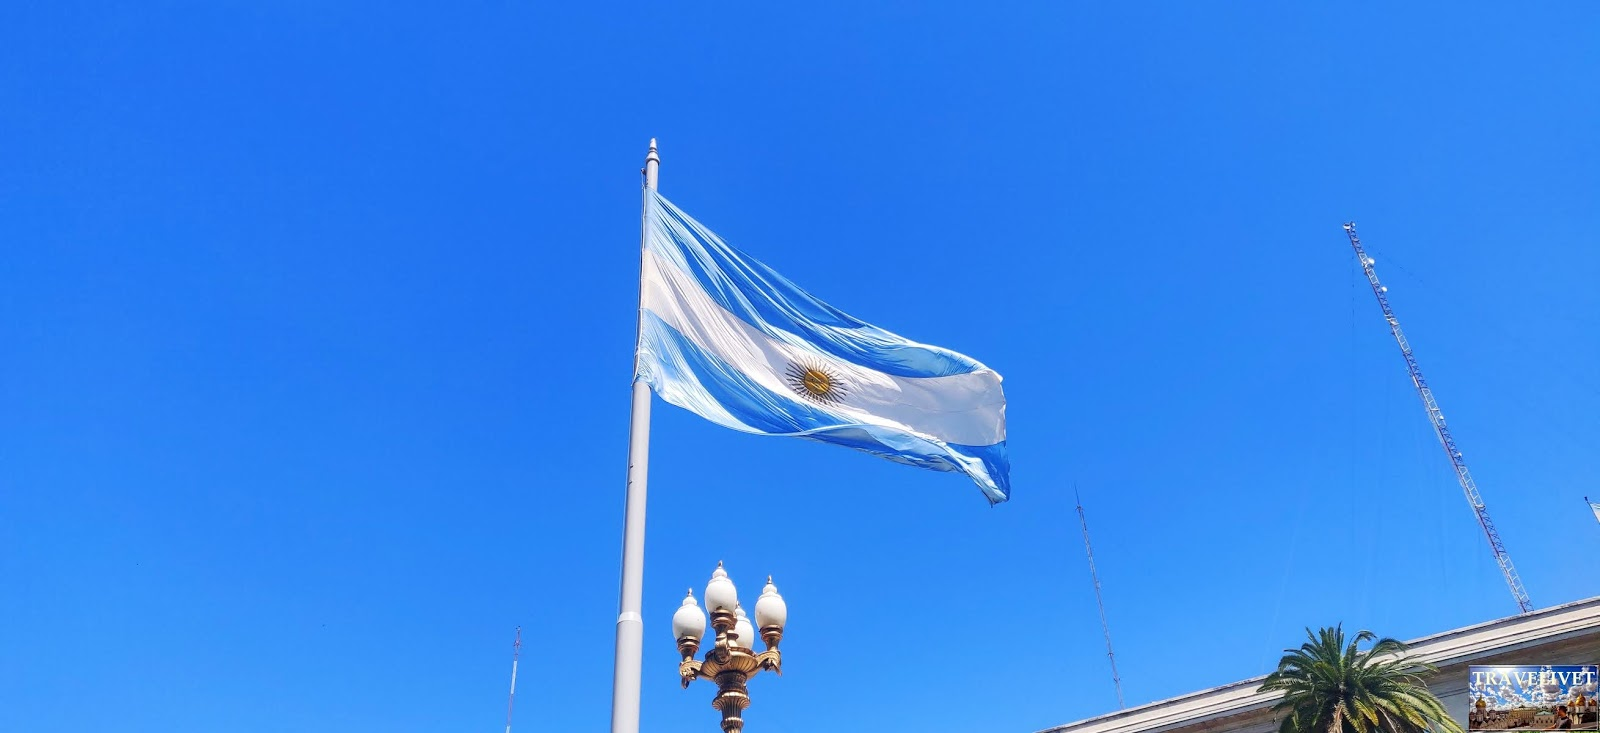 Argentine Argentina Buenos Aires